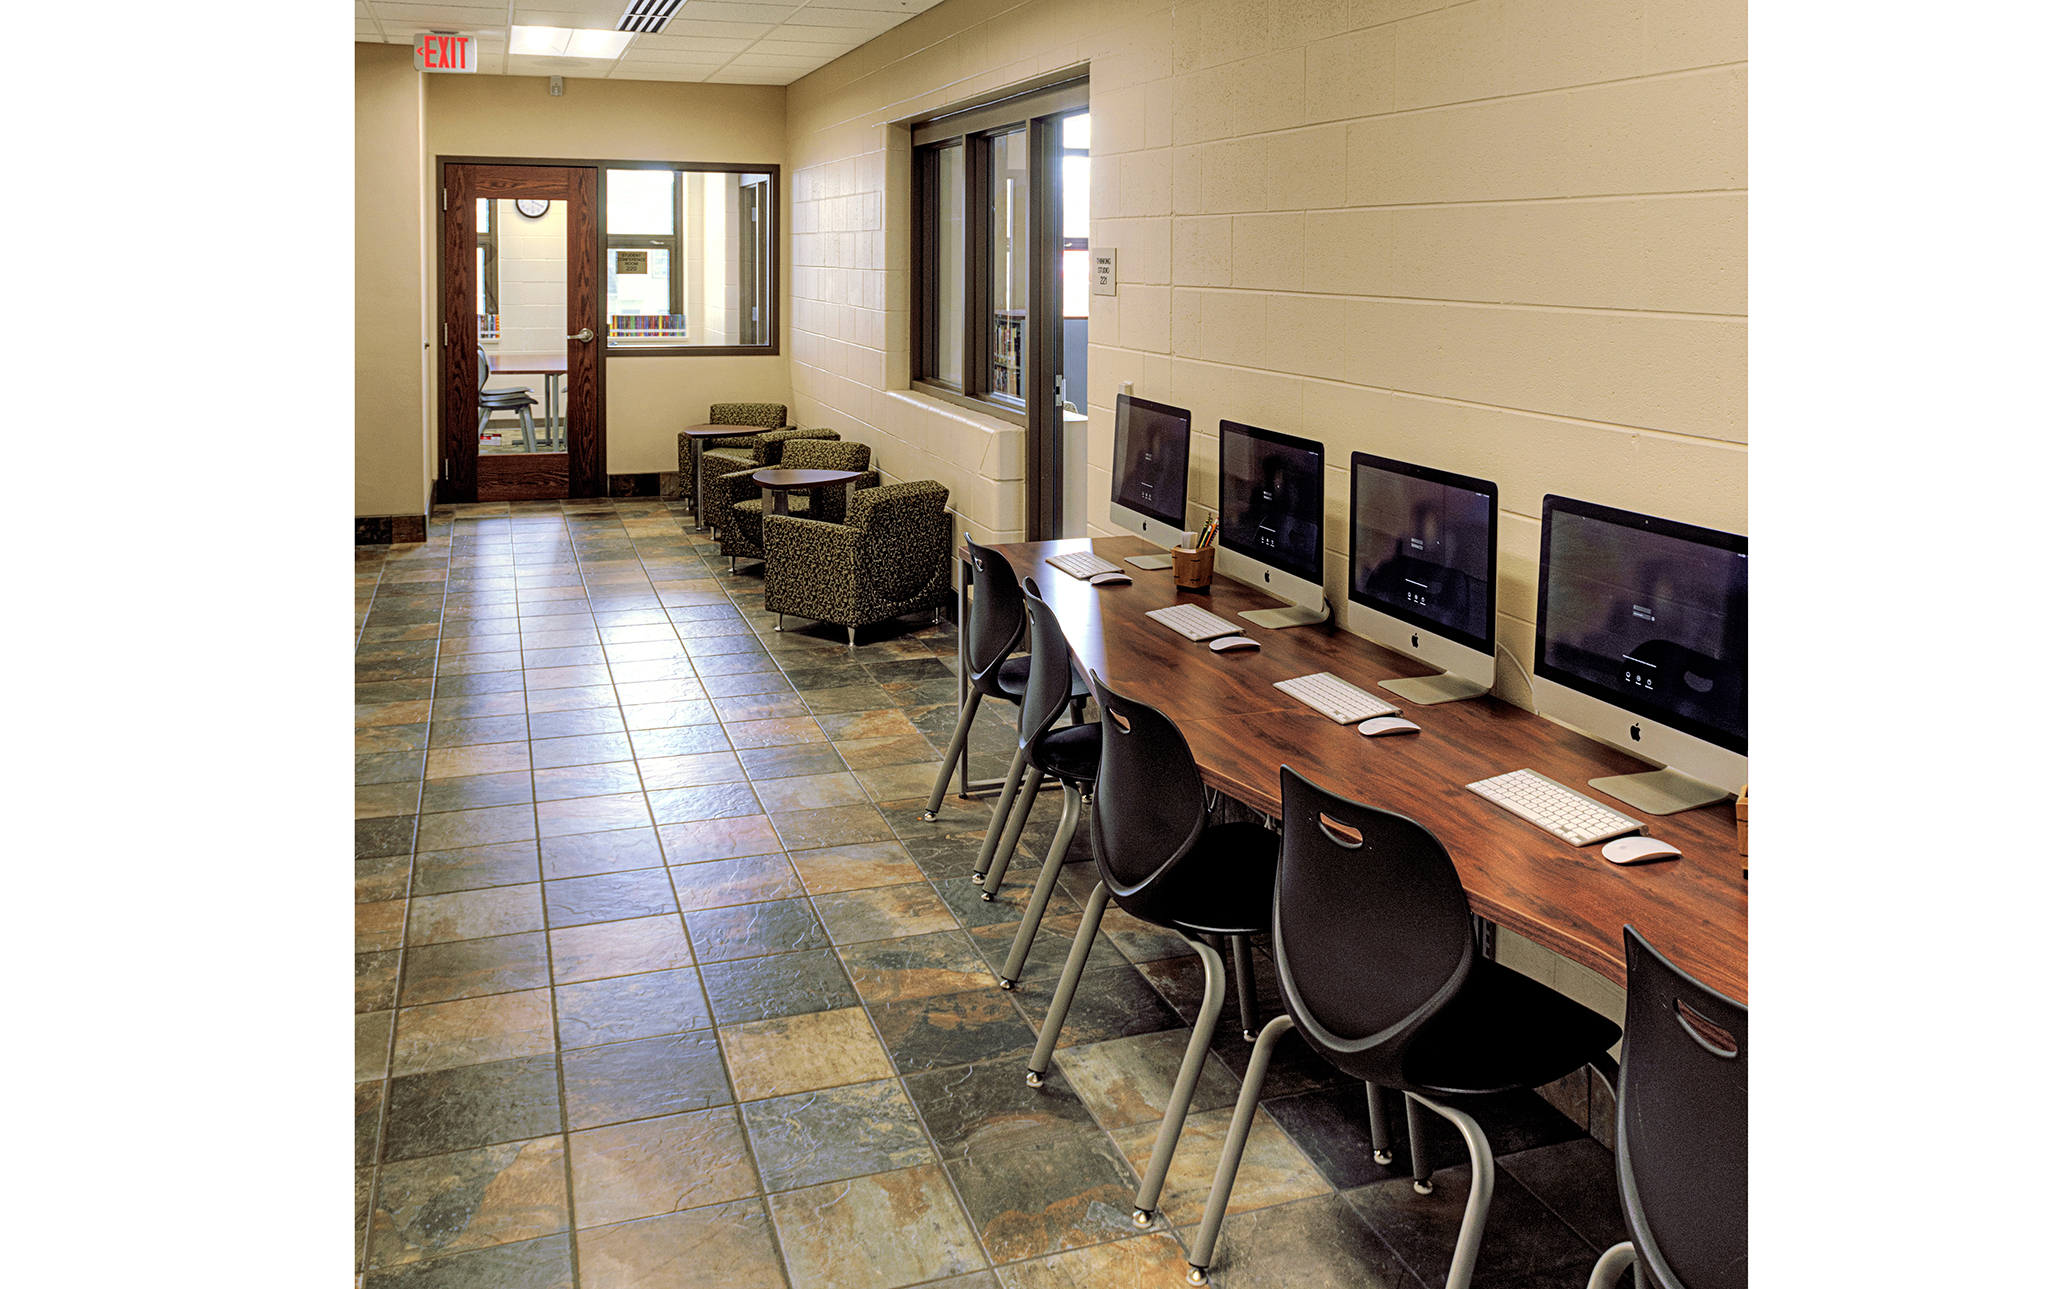 5_Leonardo-DaVinci-School-for-Gifted-Learners